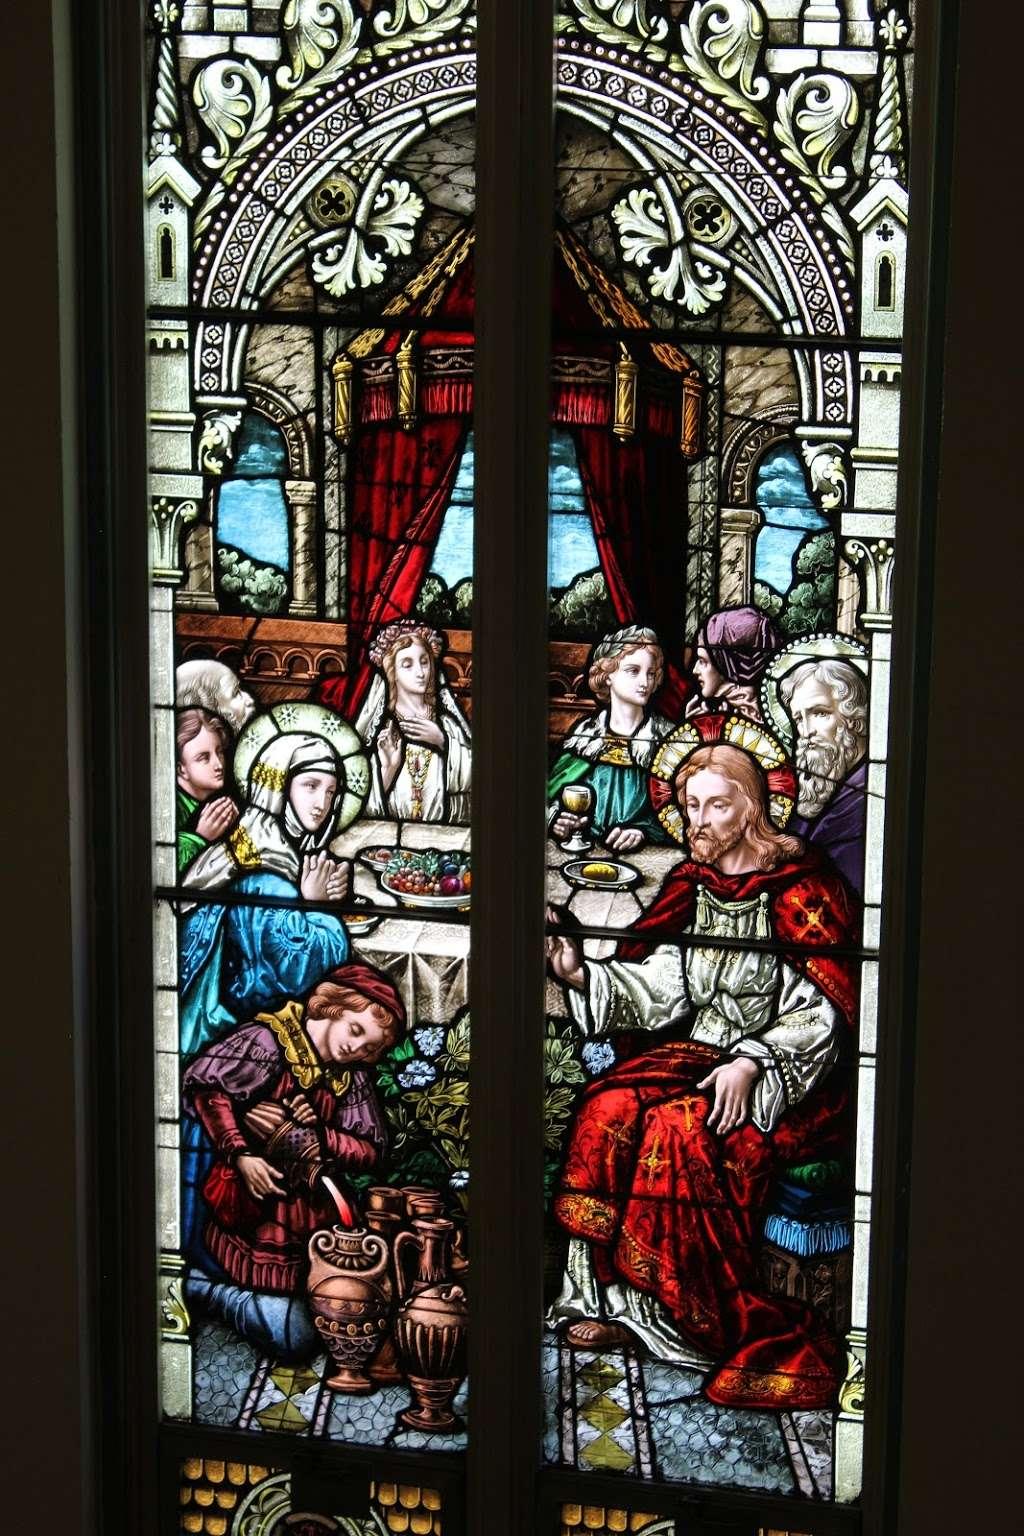 St Augustine Church - church  | Photo 8 of 10 | Address: 2530 S Howell Ave, Milwaukee, WI 53207, USA | Phone: (414) 744-0808